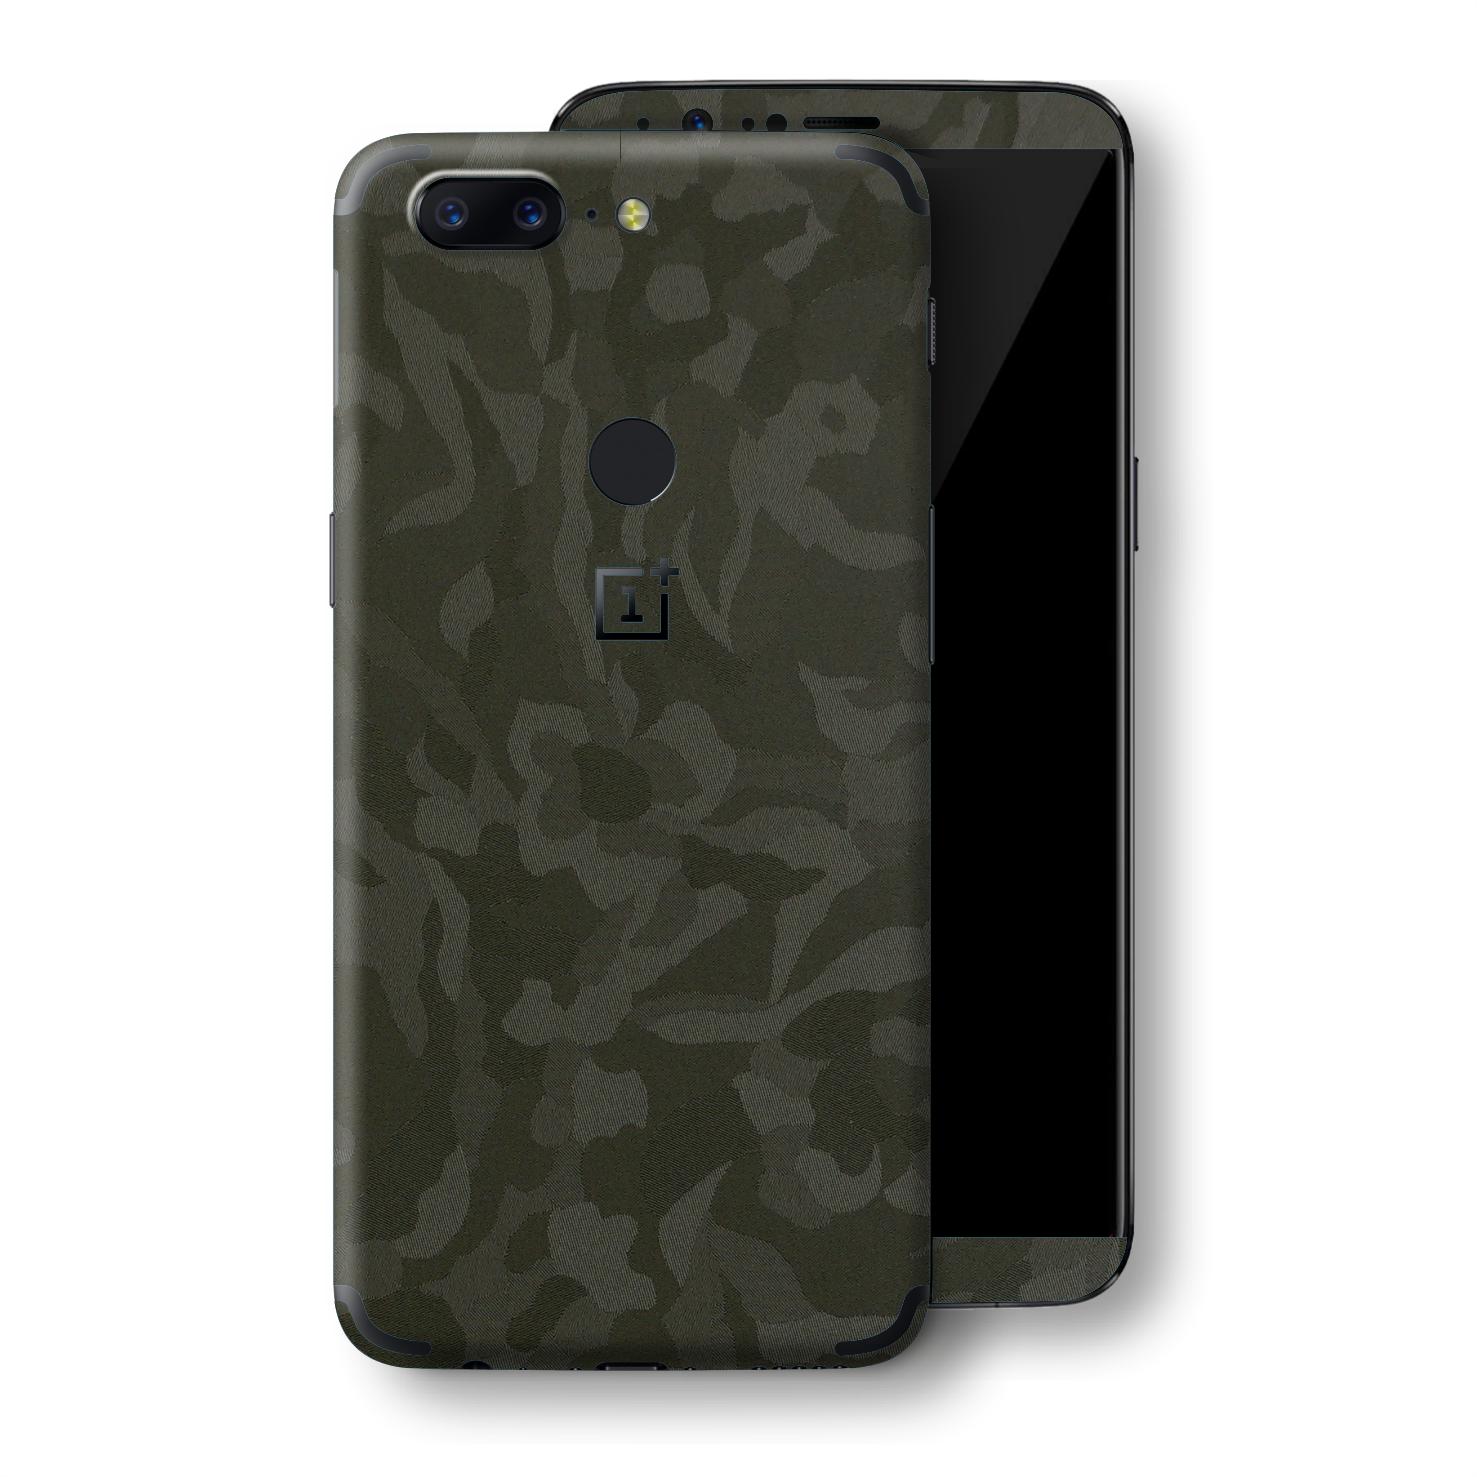 EasySkinz OnePlus 5T Luxuria GREEN Camo 3D TEXTURED Skin